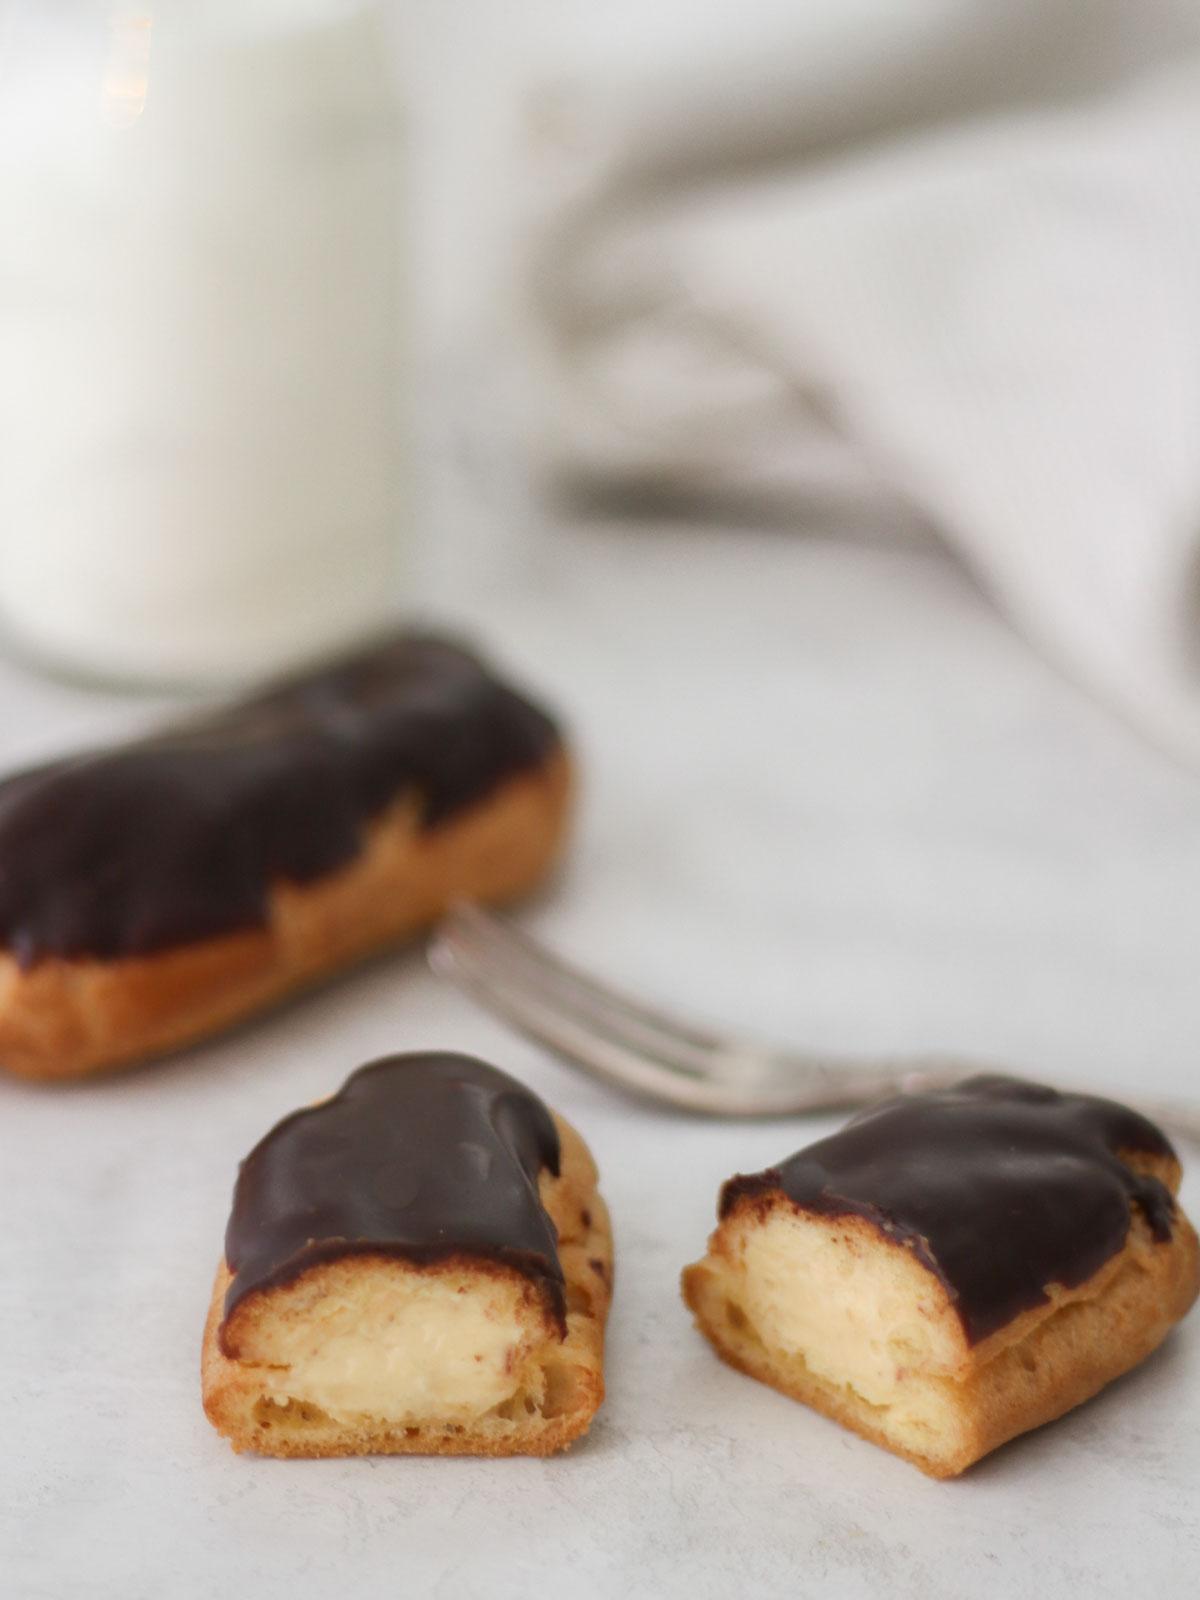 How to Make Chocolate Eclairs